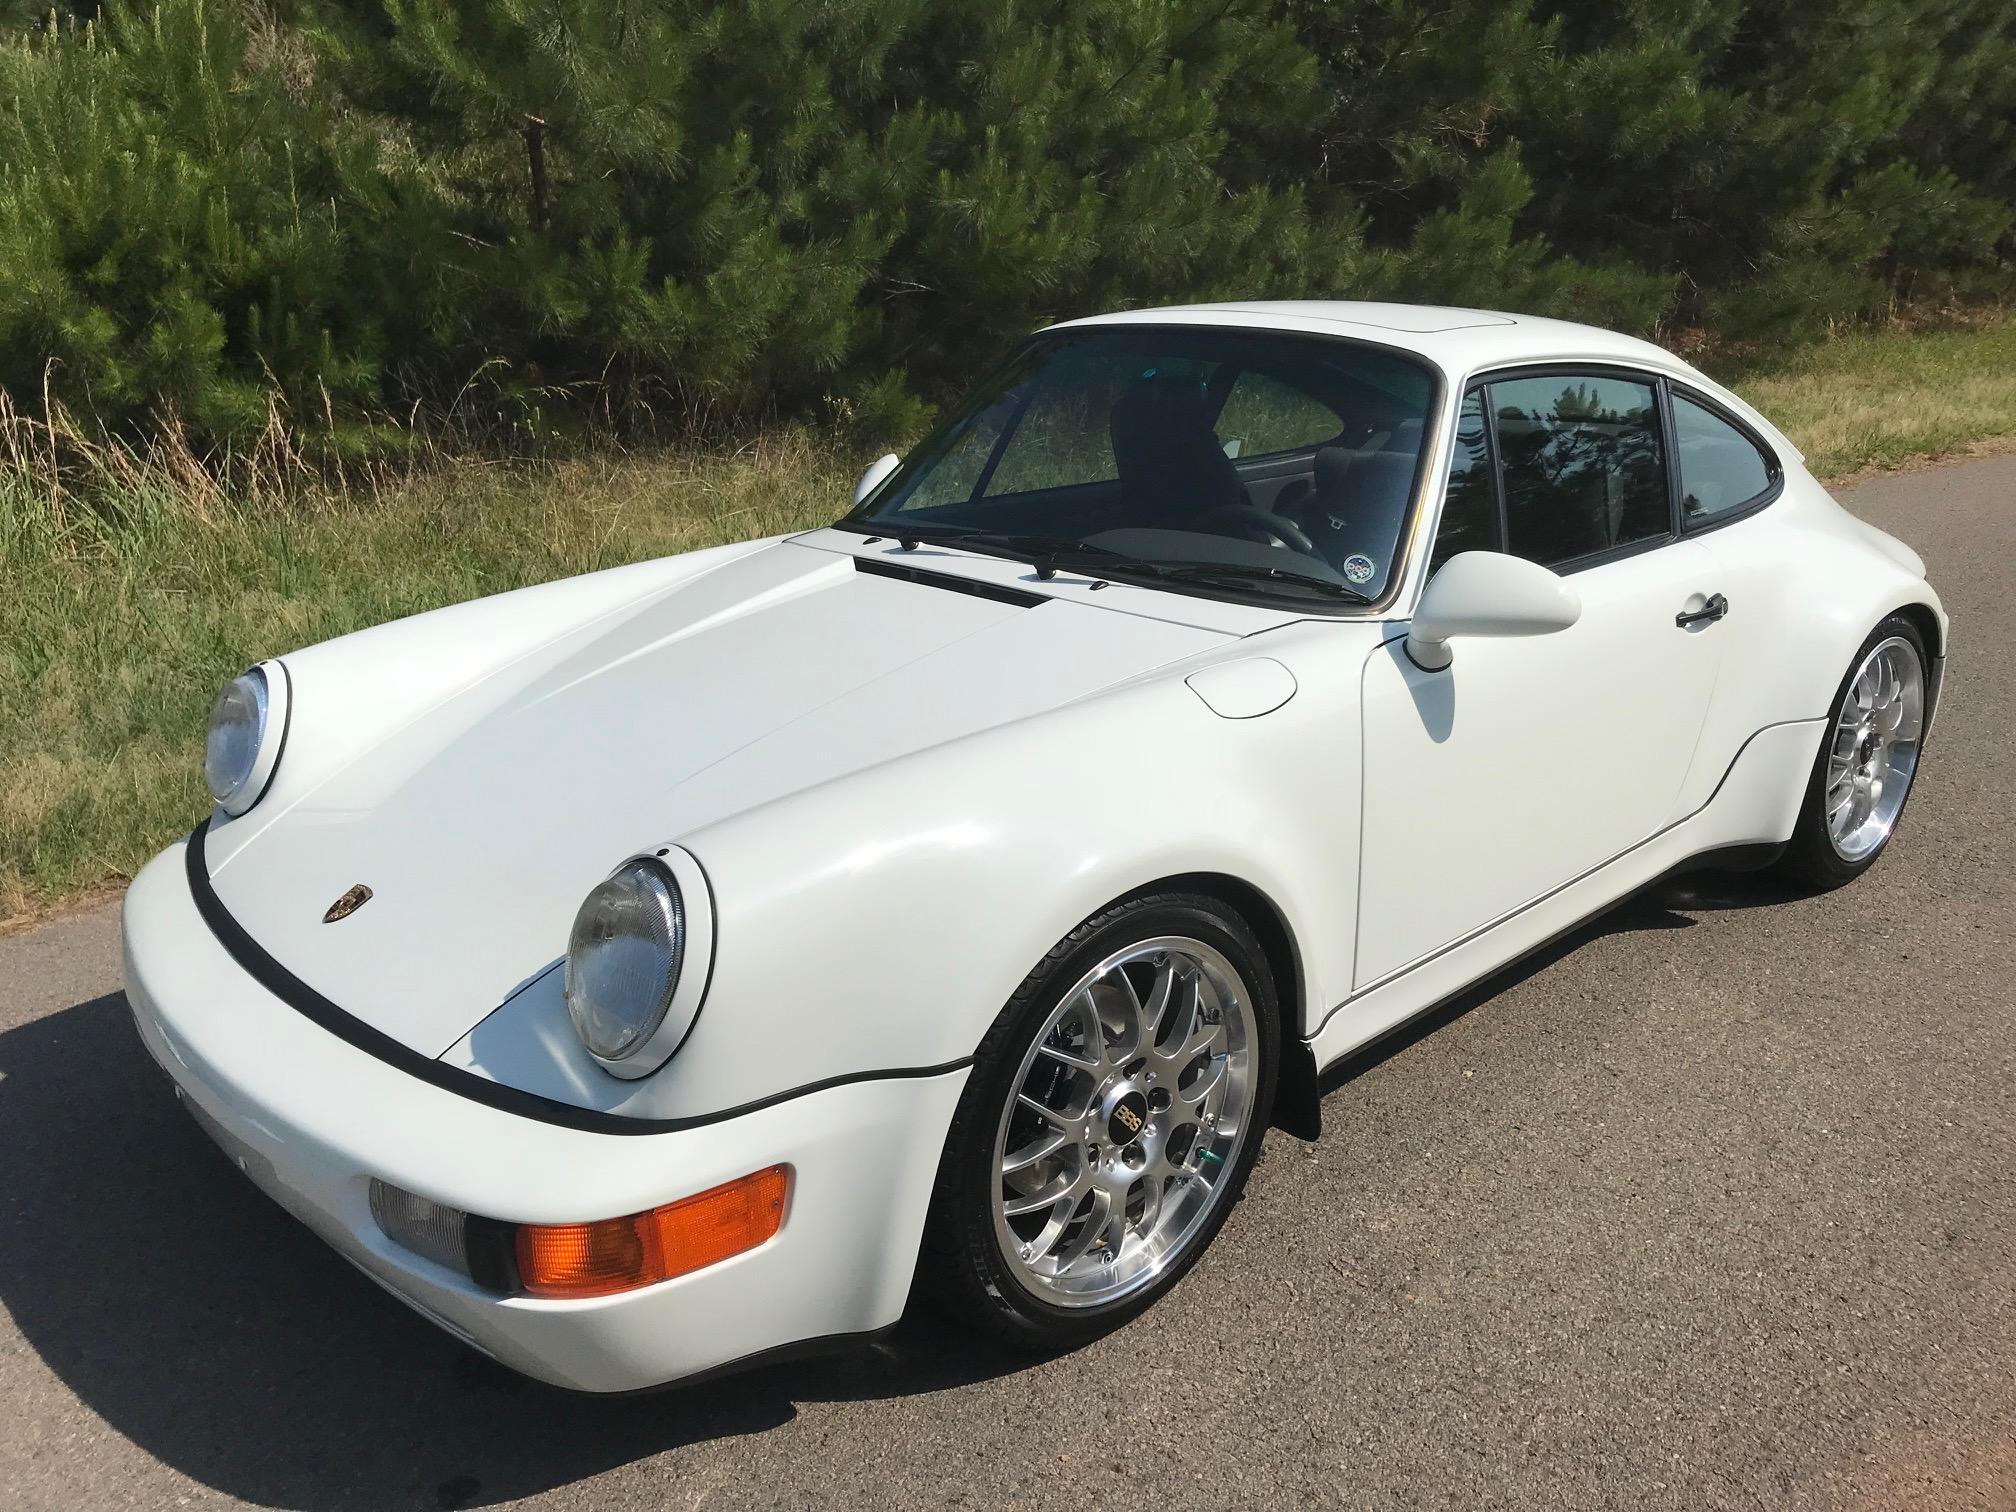 Porsche 964 30th Anniversary